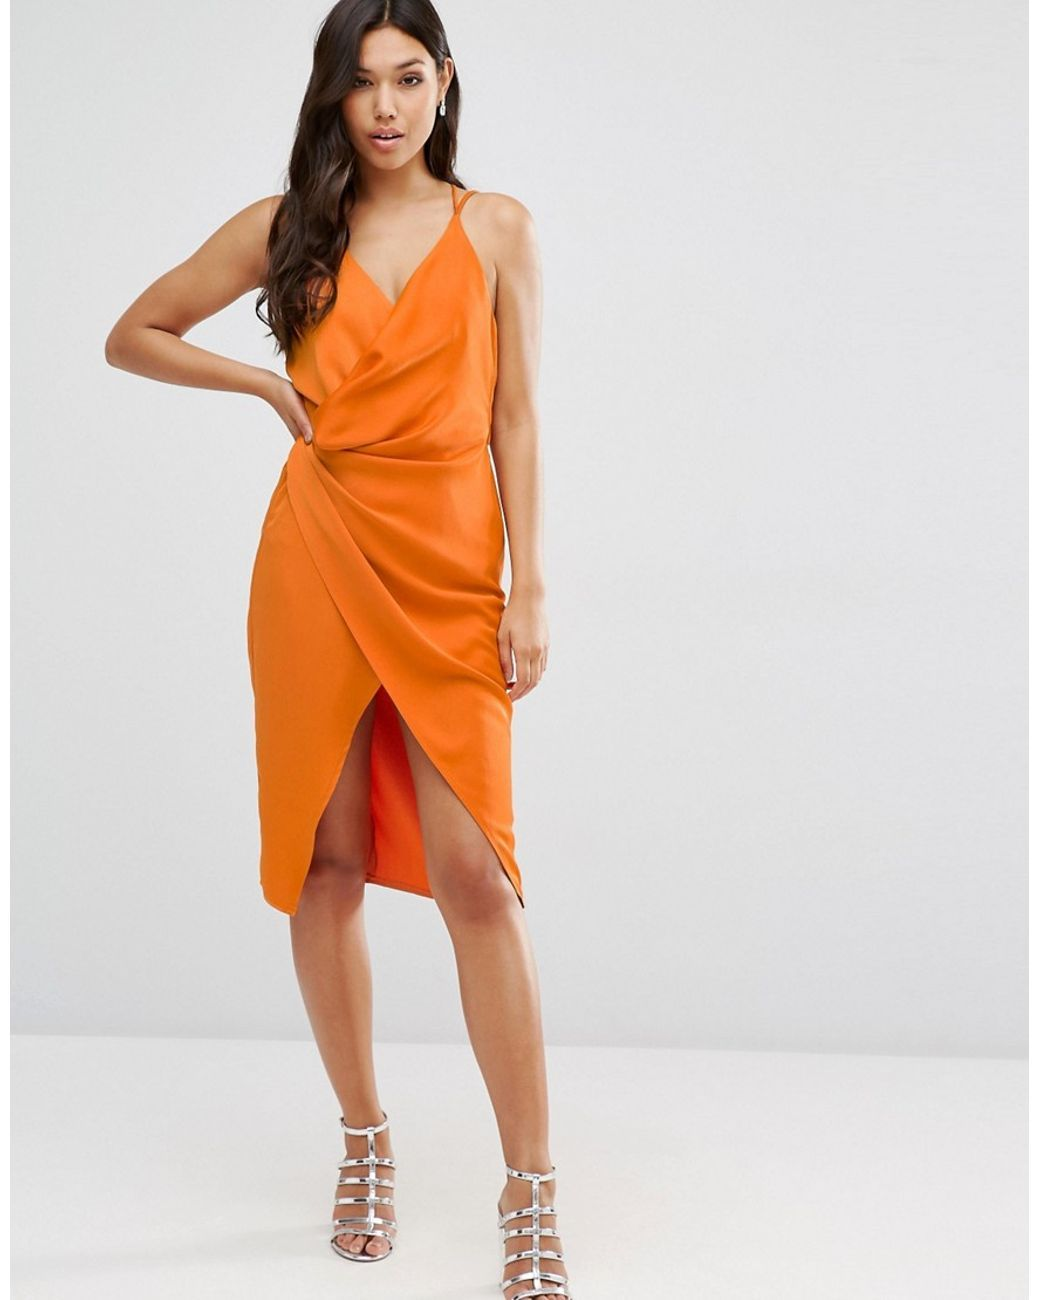 Women\'s Orange Strappy Drape Front Midi Dress | Midi dresses and ...